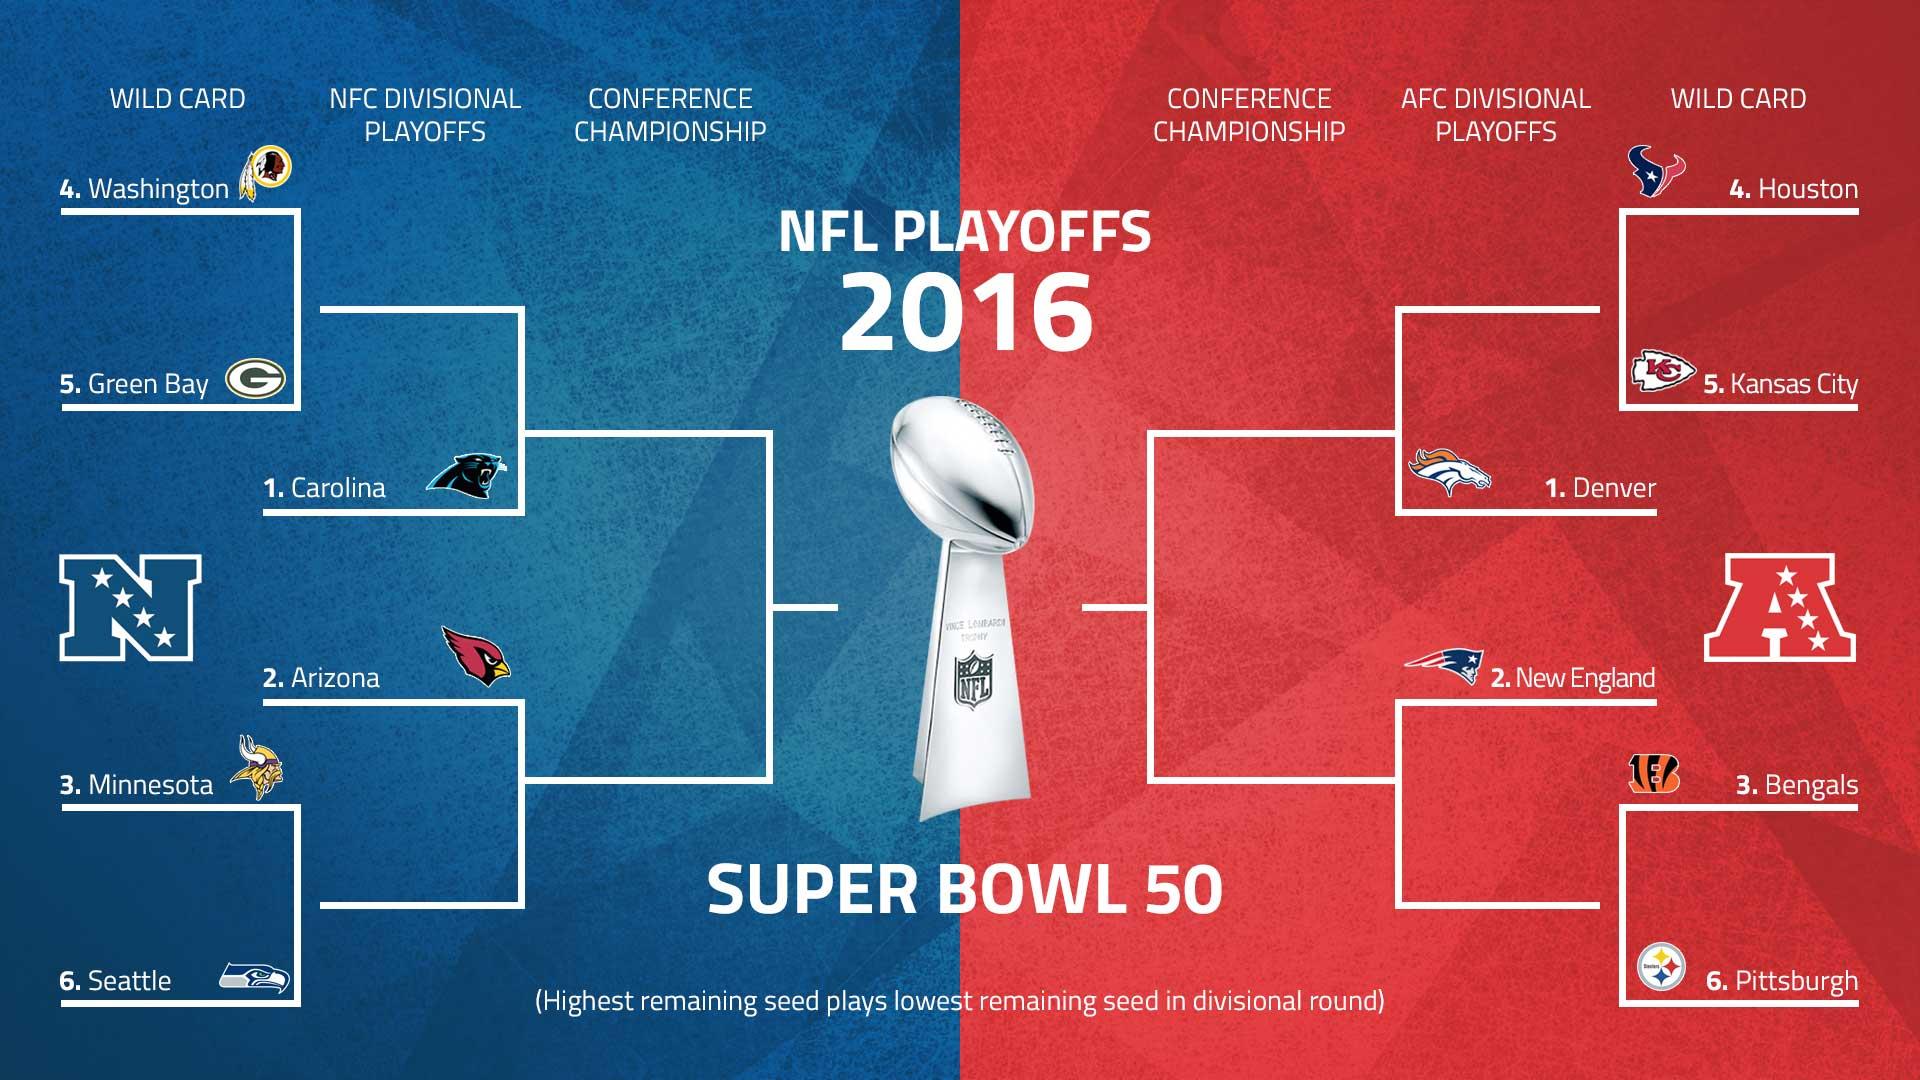 [HILO UNICO] NFL 2019/2020 - Página 4 Nflplayoffbracket_fl81wdctn8hp16m1ujjr1l29d